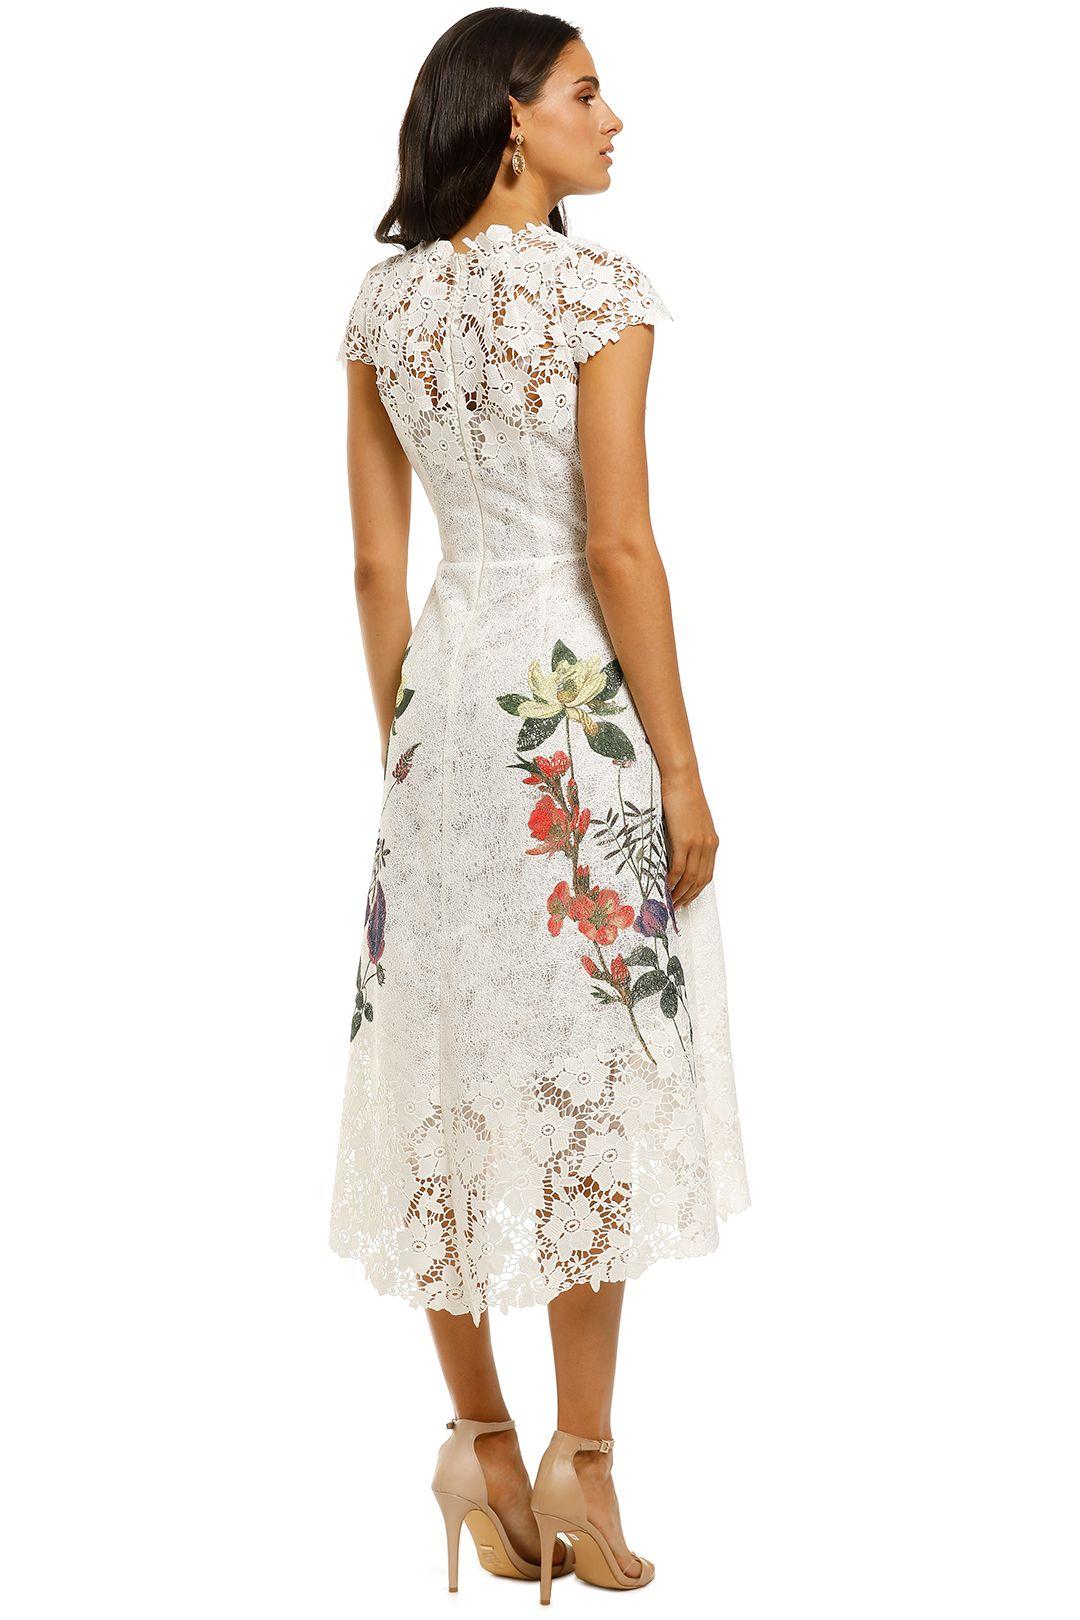 Moos-and-Spy-Fleur-Dress-White-Back